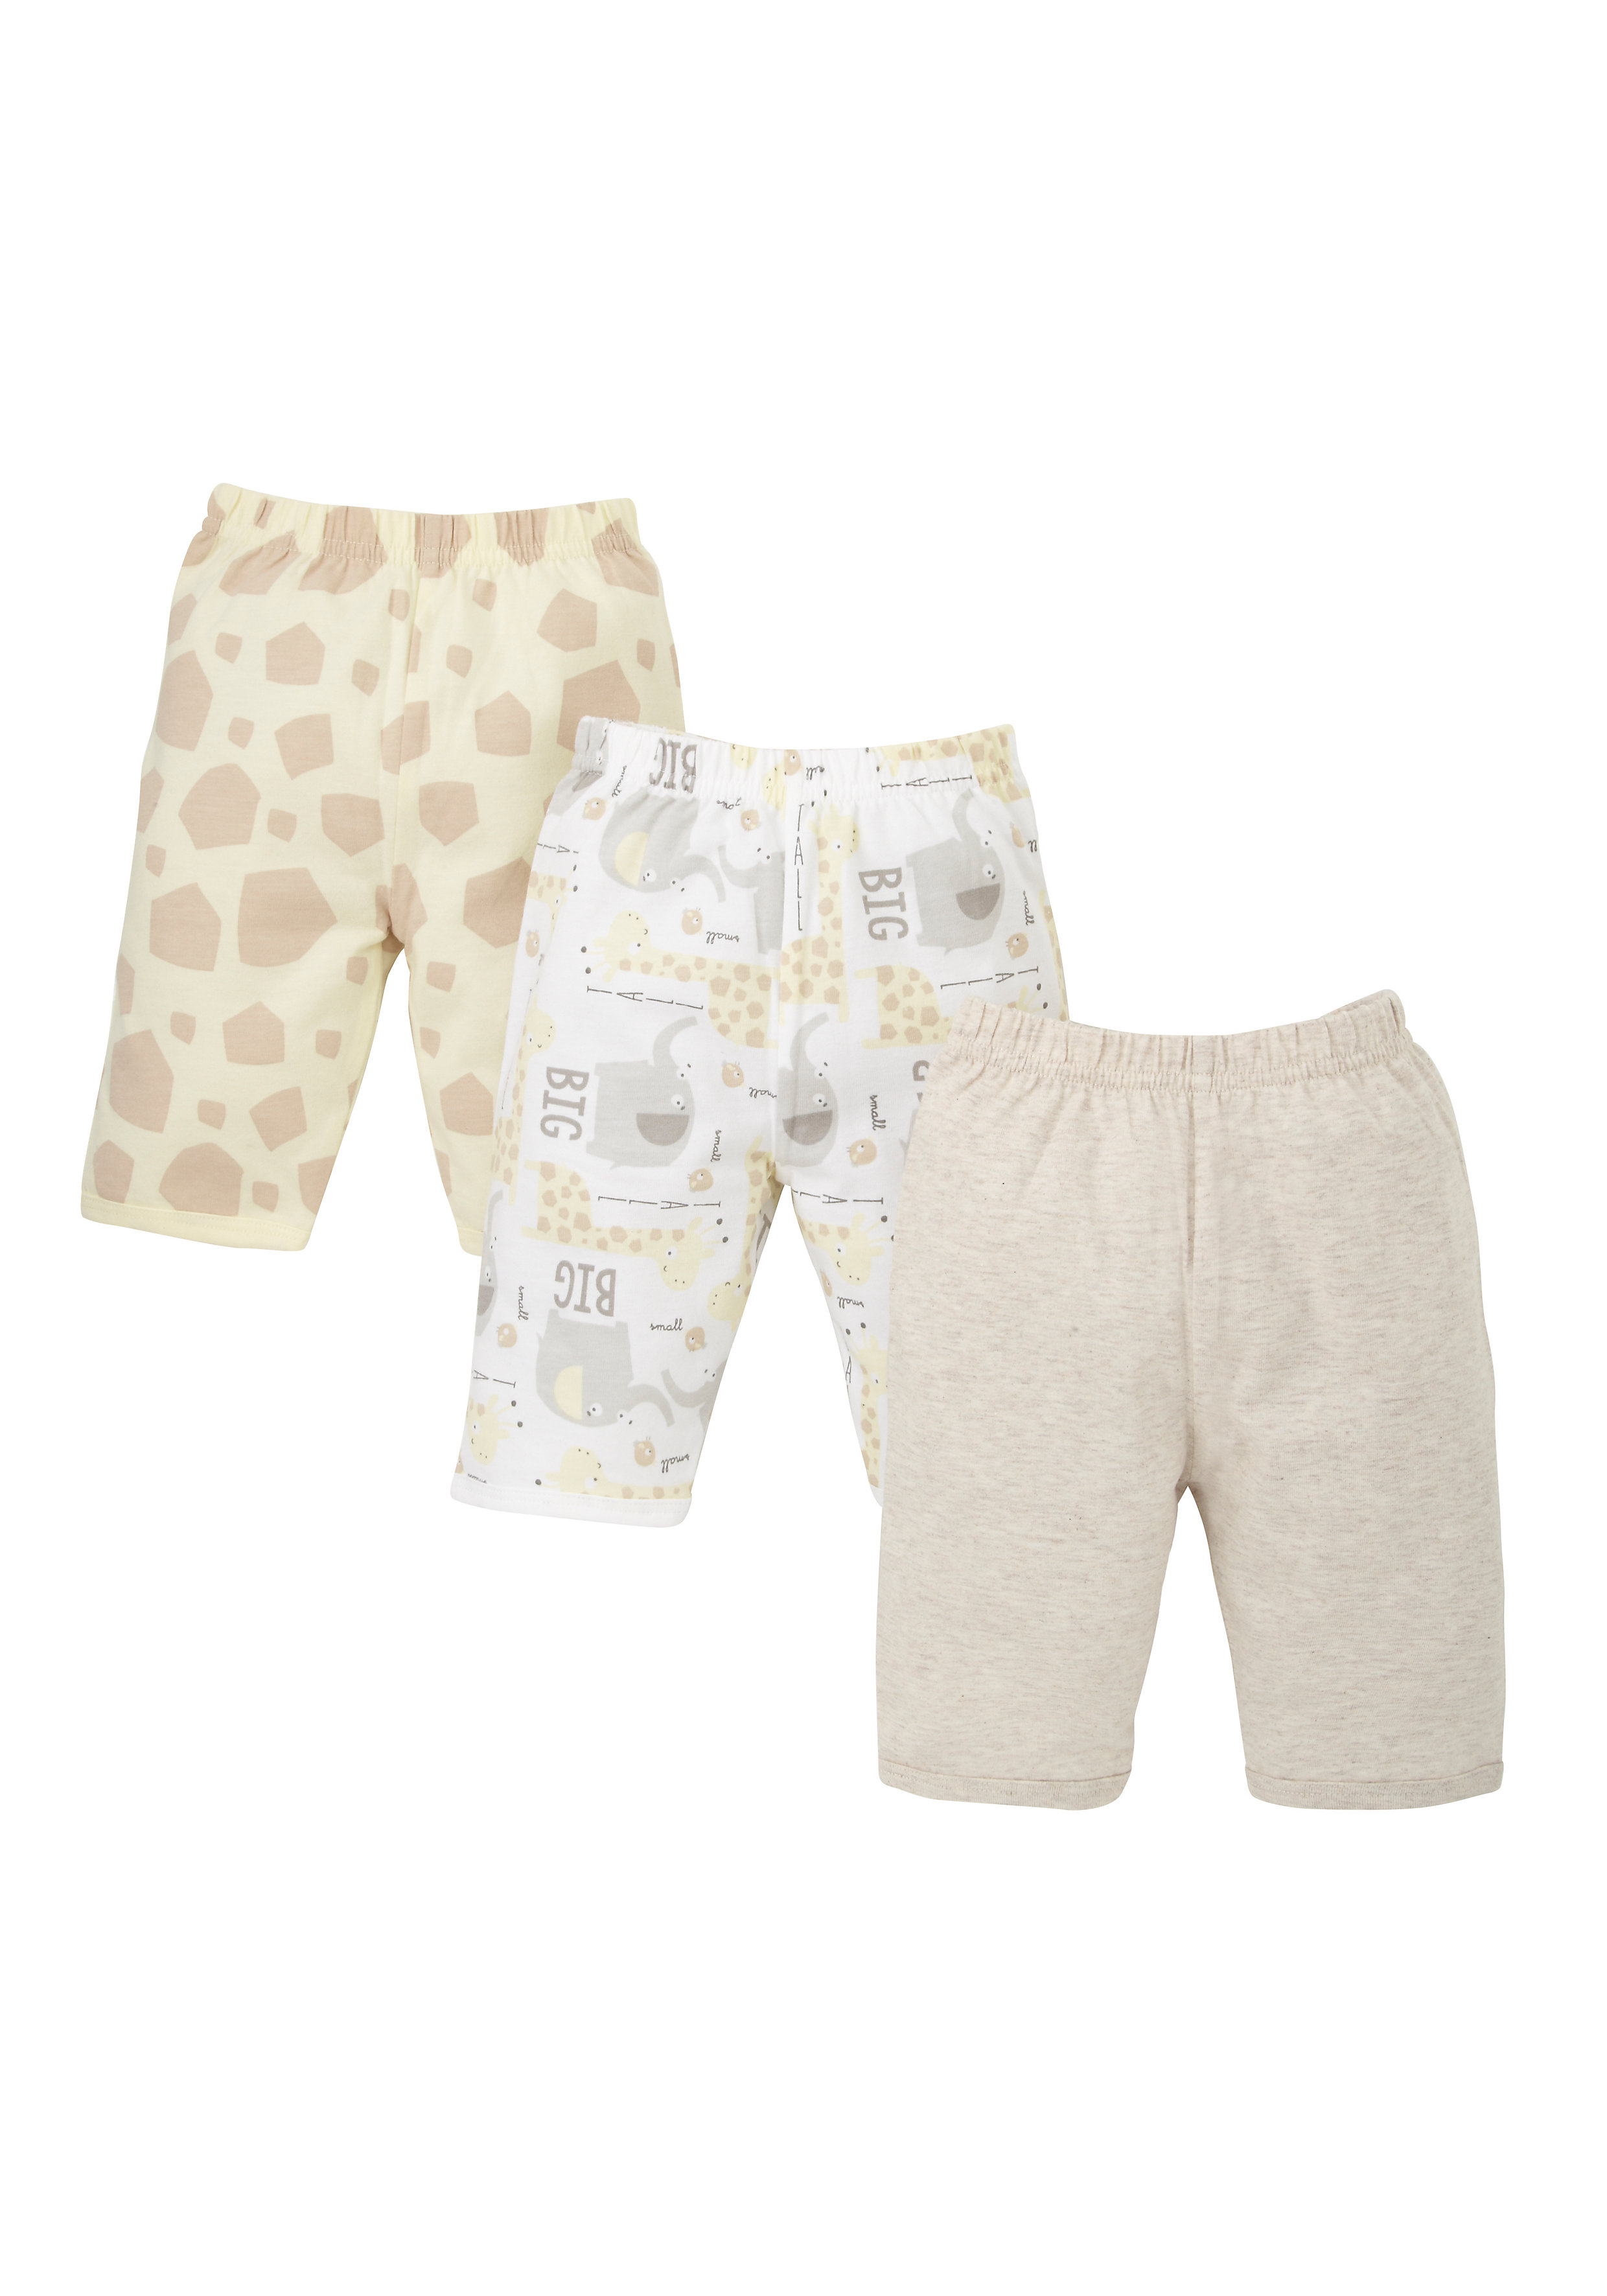 Mothercare | Unisex Pyjama Bottom Set - Pack of 3 - Multicolor